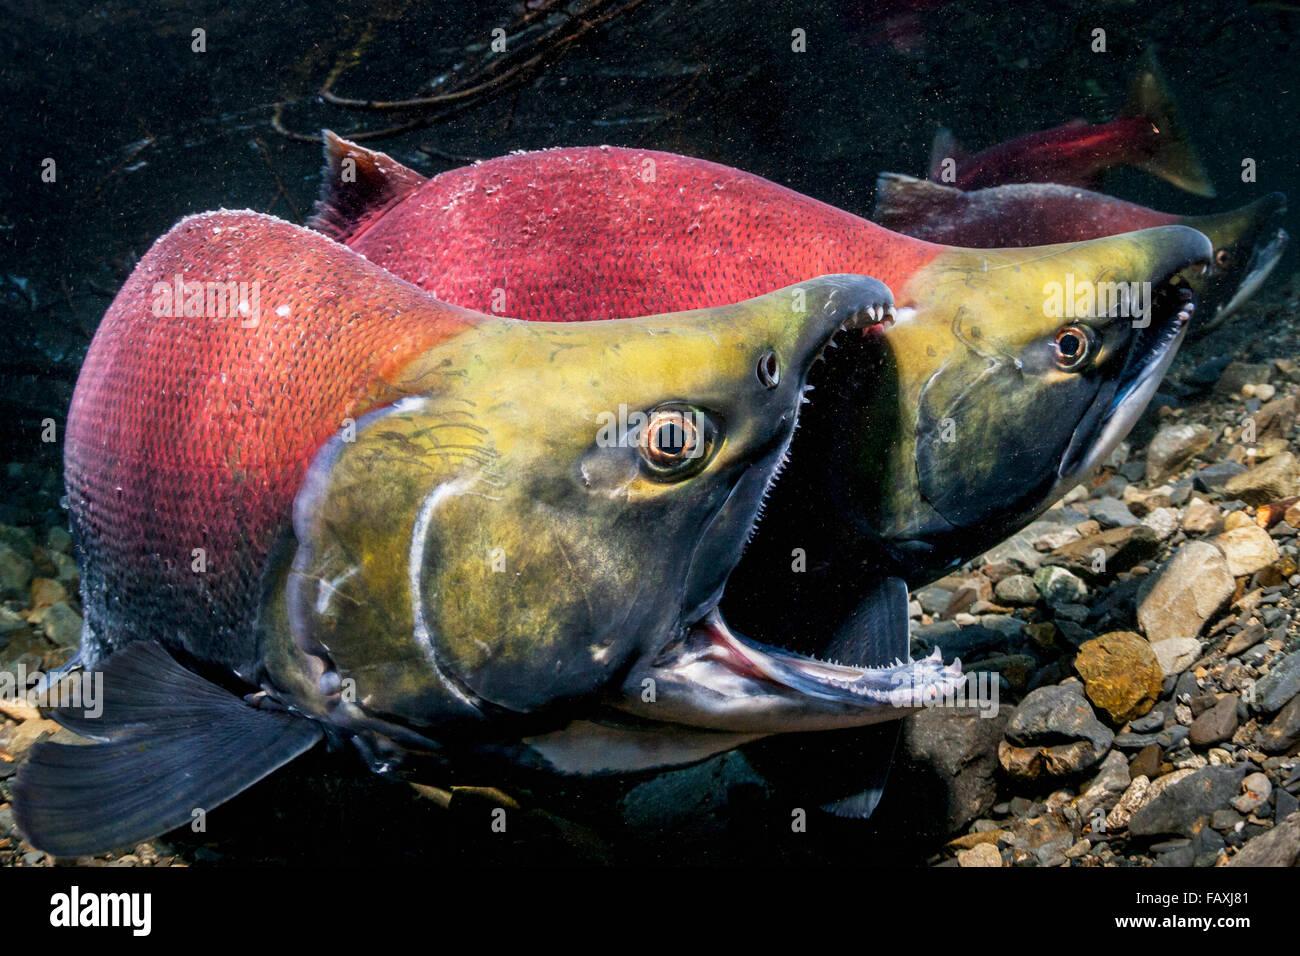 A male Sockeye Salmon (Oncorhynchus nerka) fends off an intruding male with the gape threat in an Alaskan stream - Stock Image